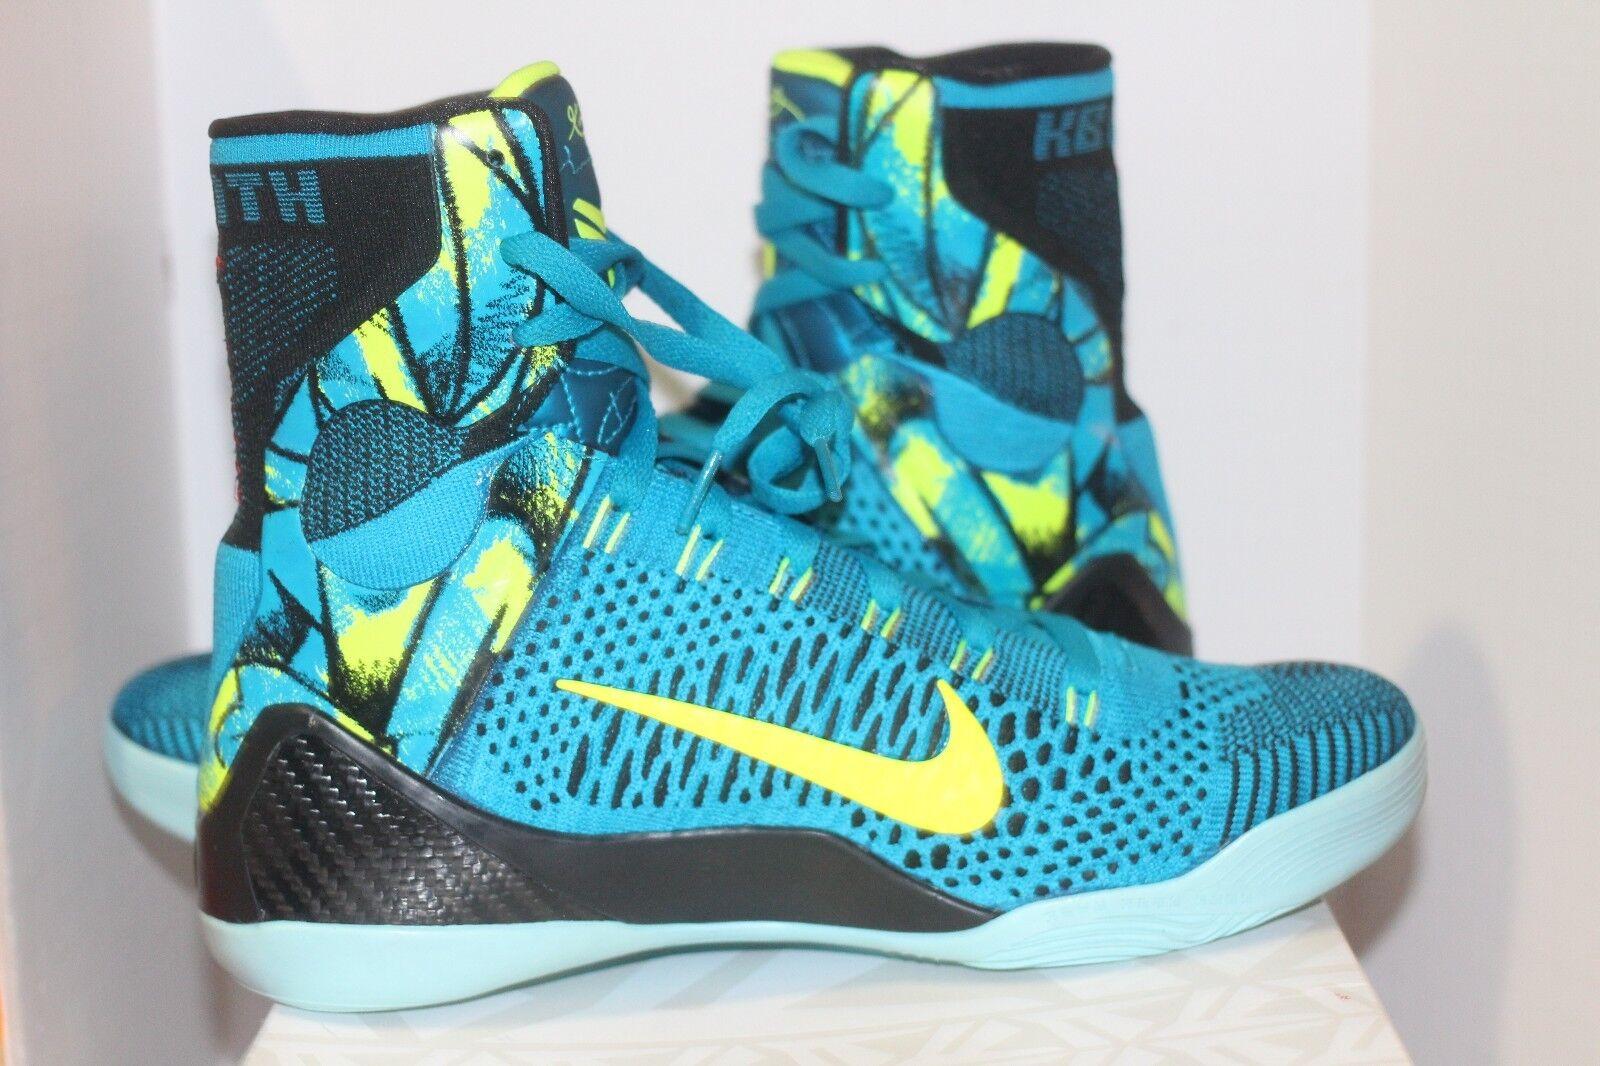 Nike Kobe IX 9 Size 10 DS DS DS Prespective Volt Neon Turq W Receipt dea137